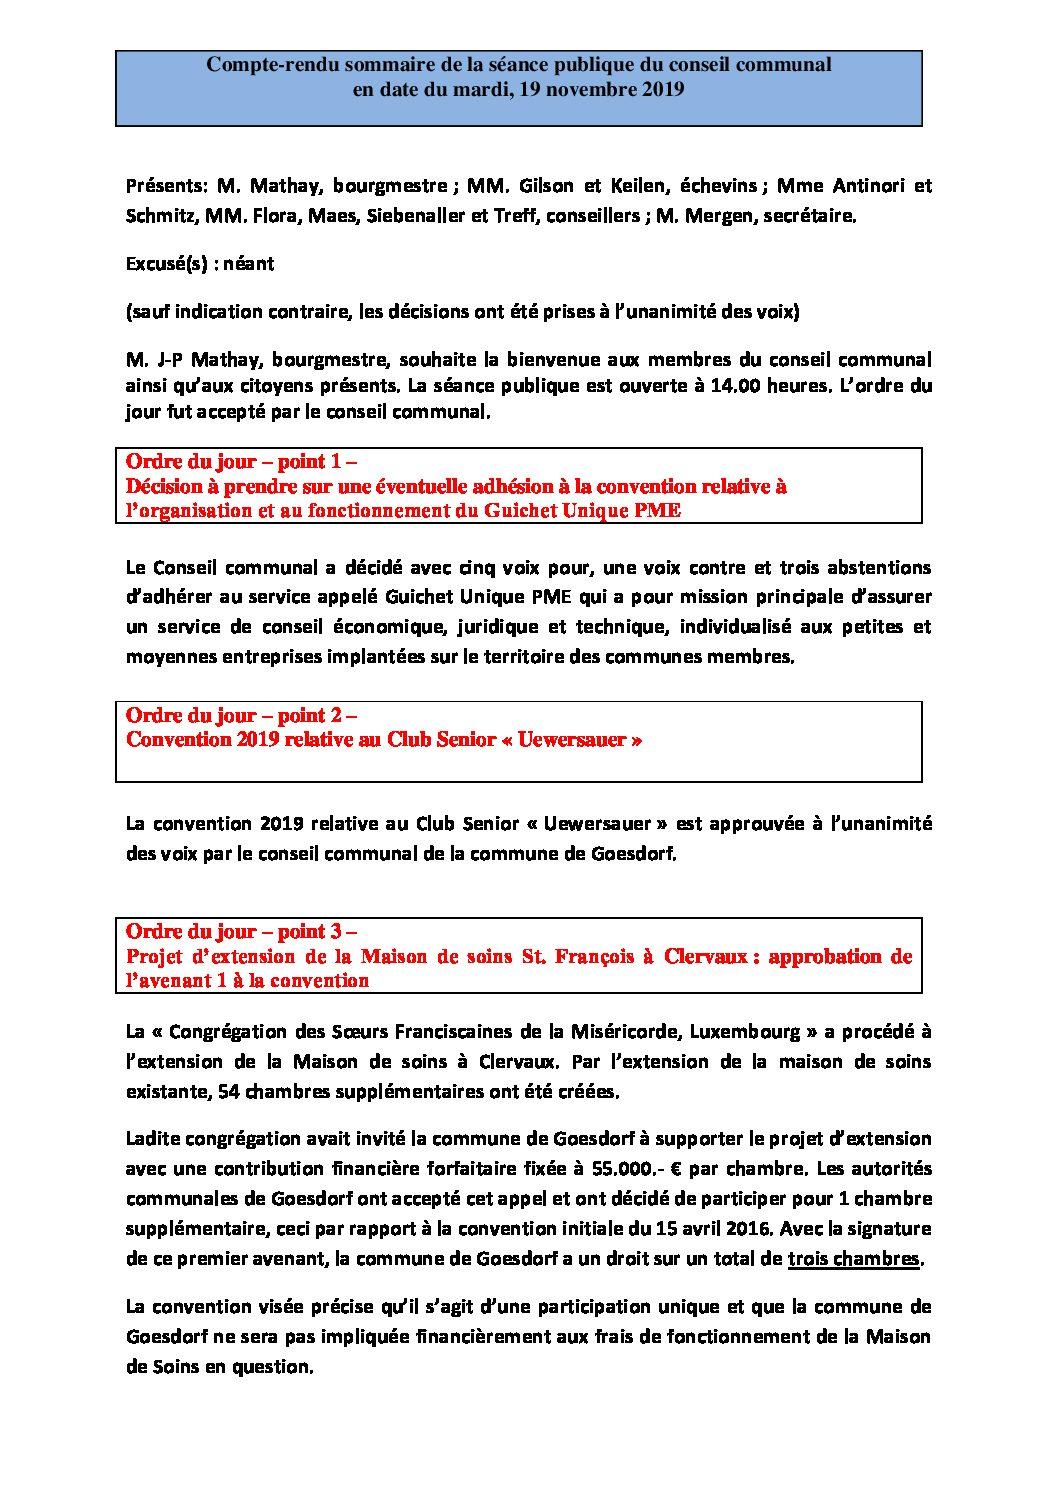 Rapport Conseil communal 19-11-2019